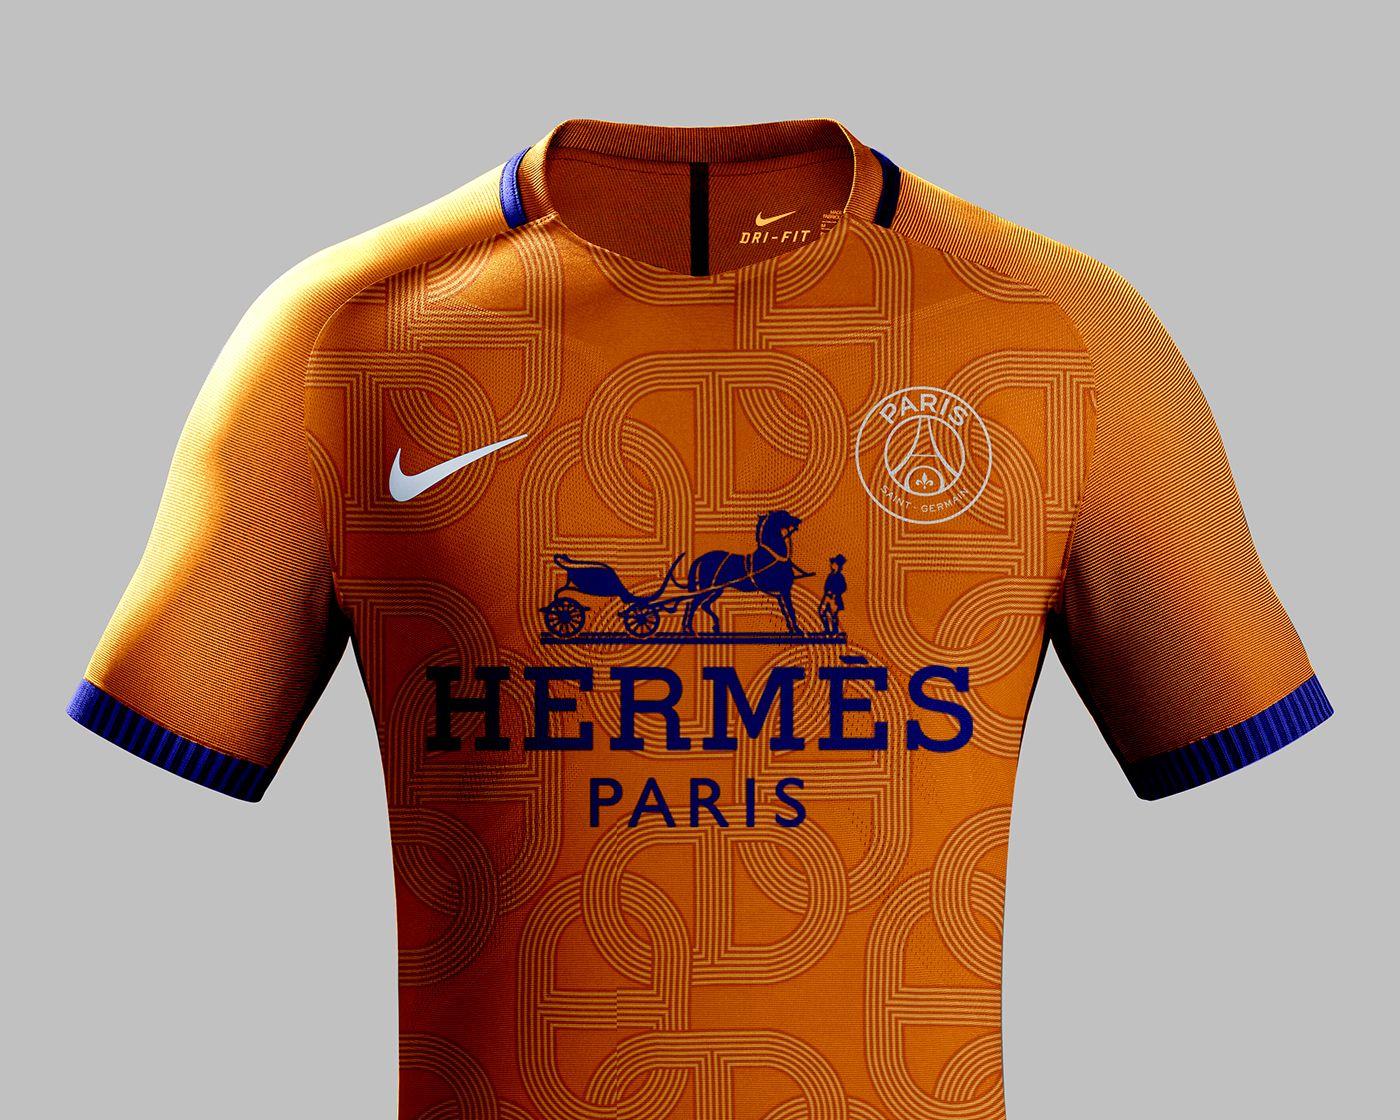 Luxury Brand Football Kits on Behance  cb7193777